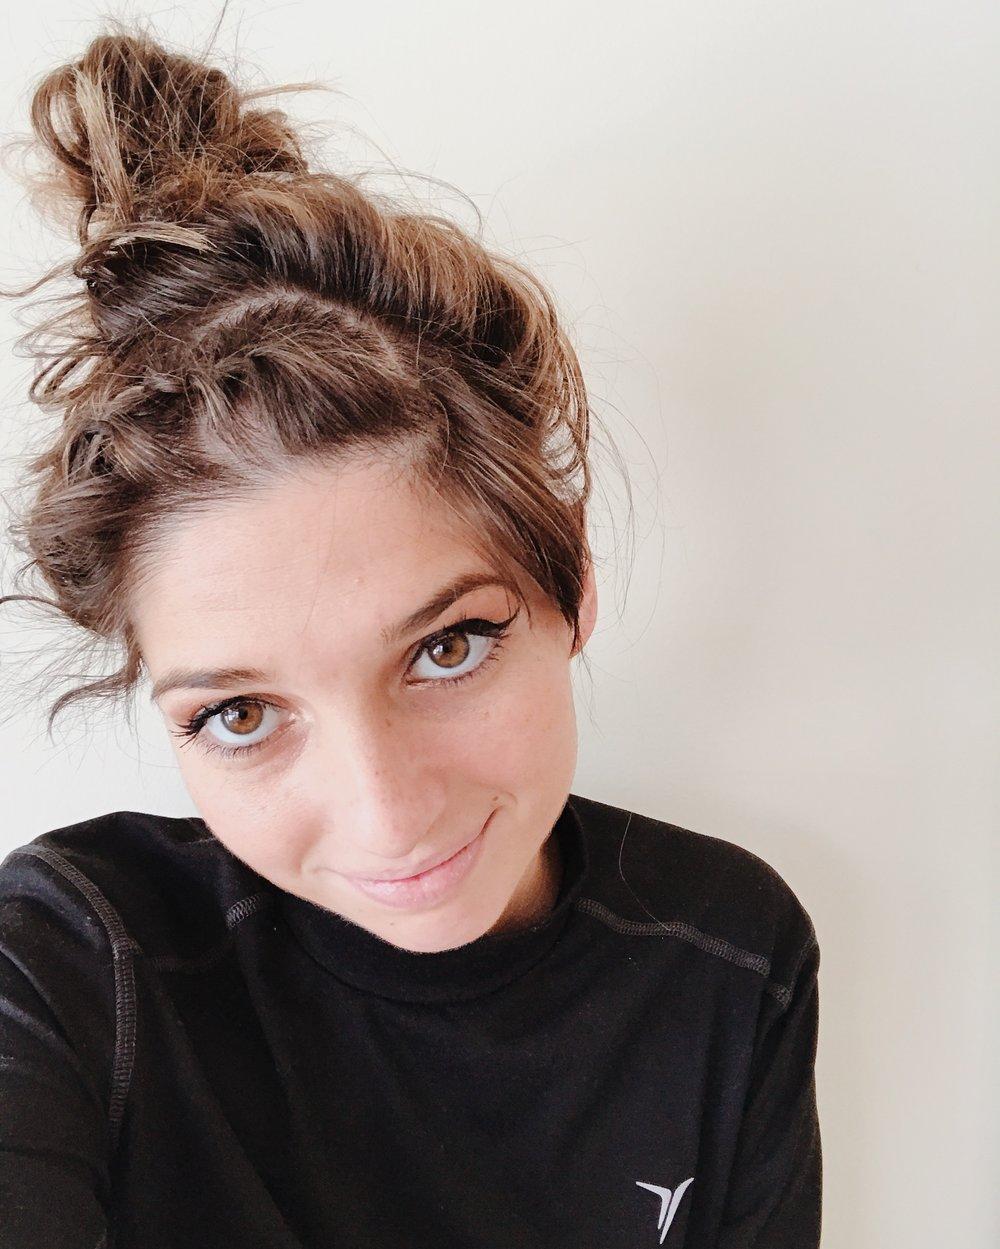 Kayla Zilch